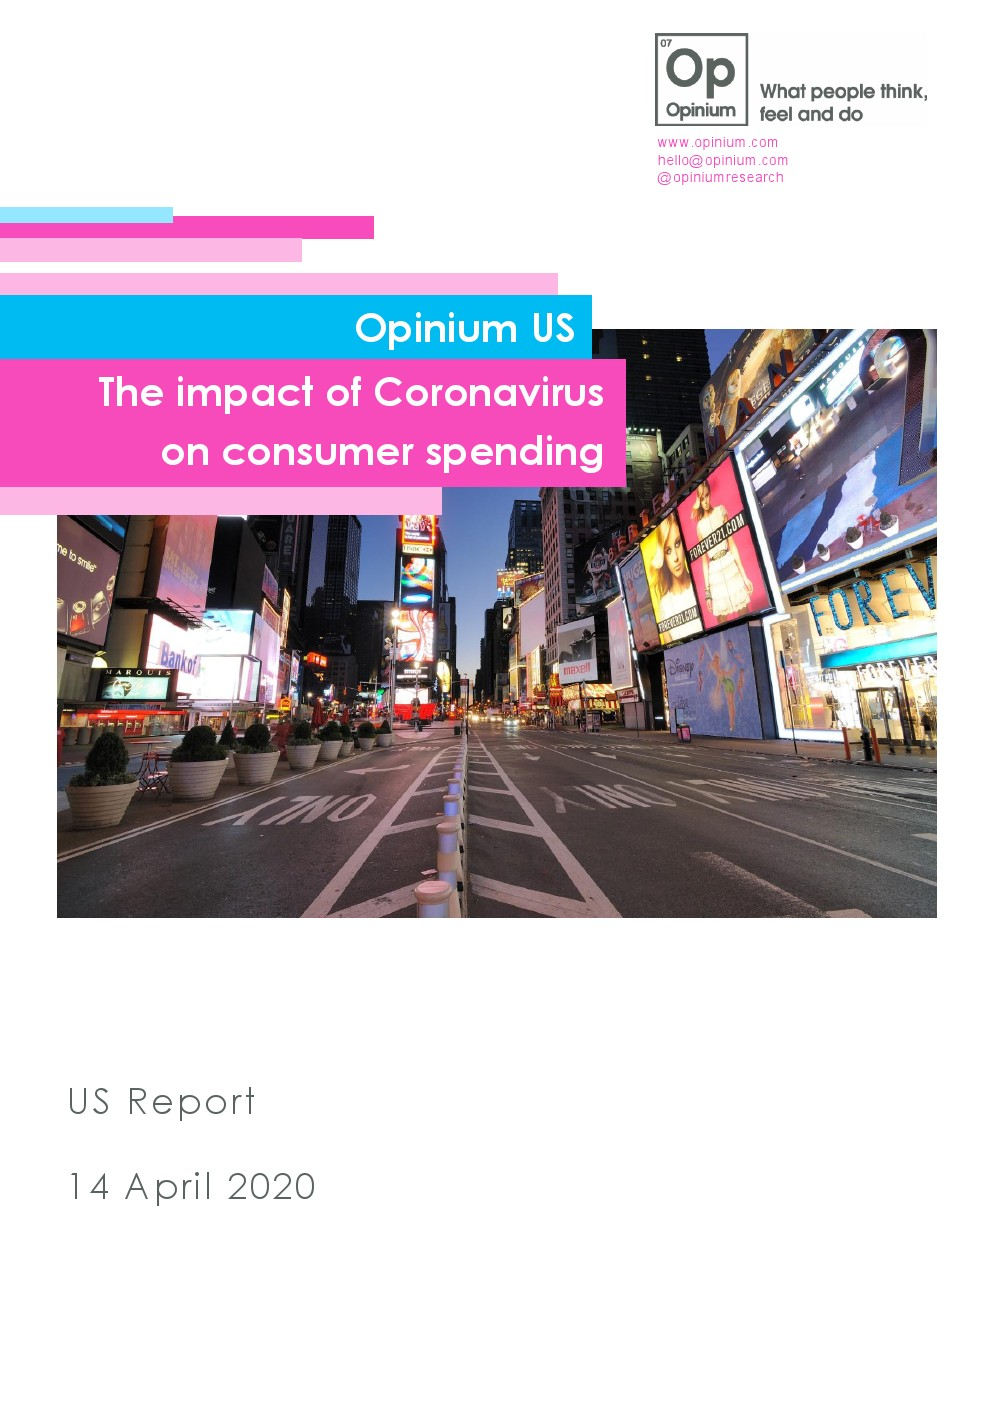 Opdium:一半的美国消费者因病毒流行计划削减支出